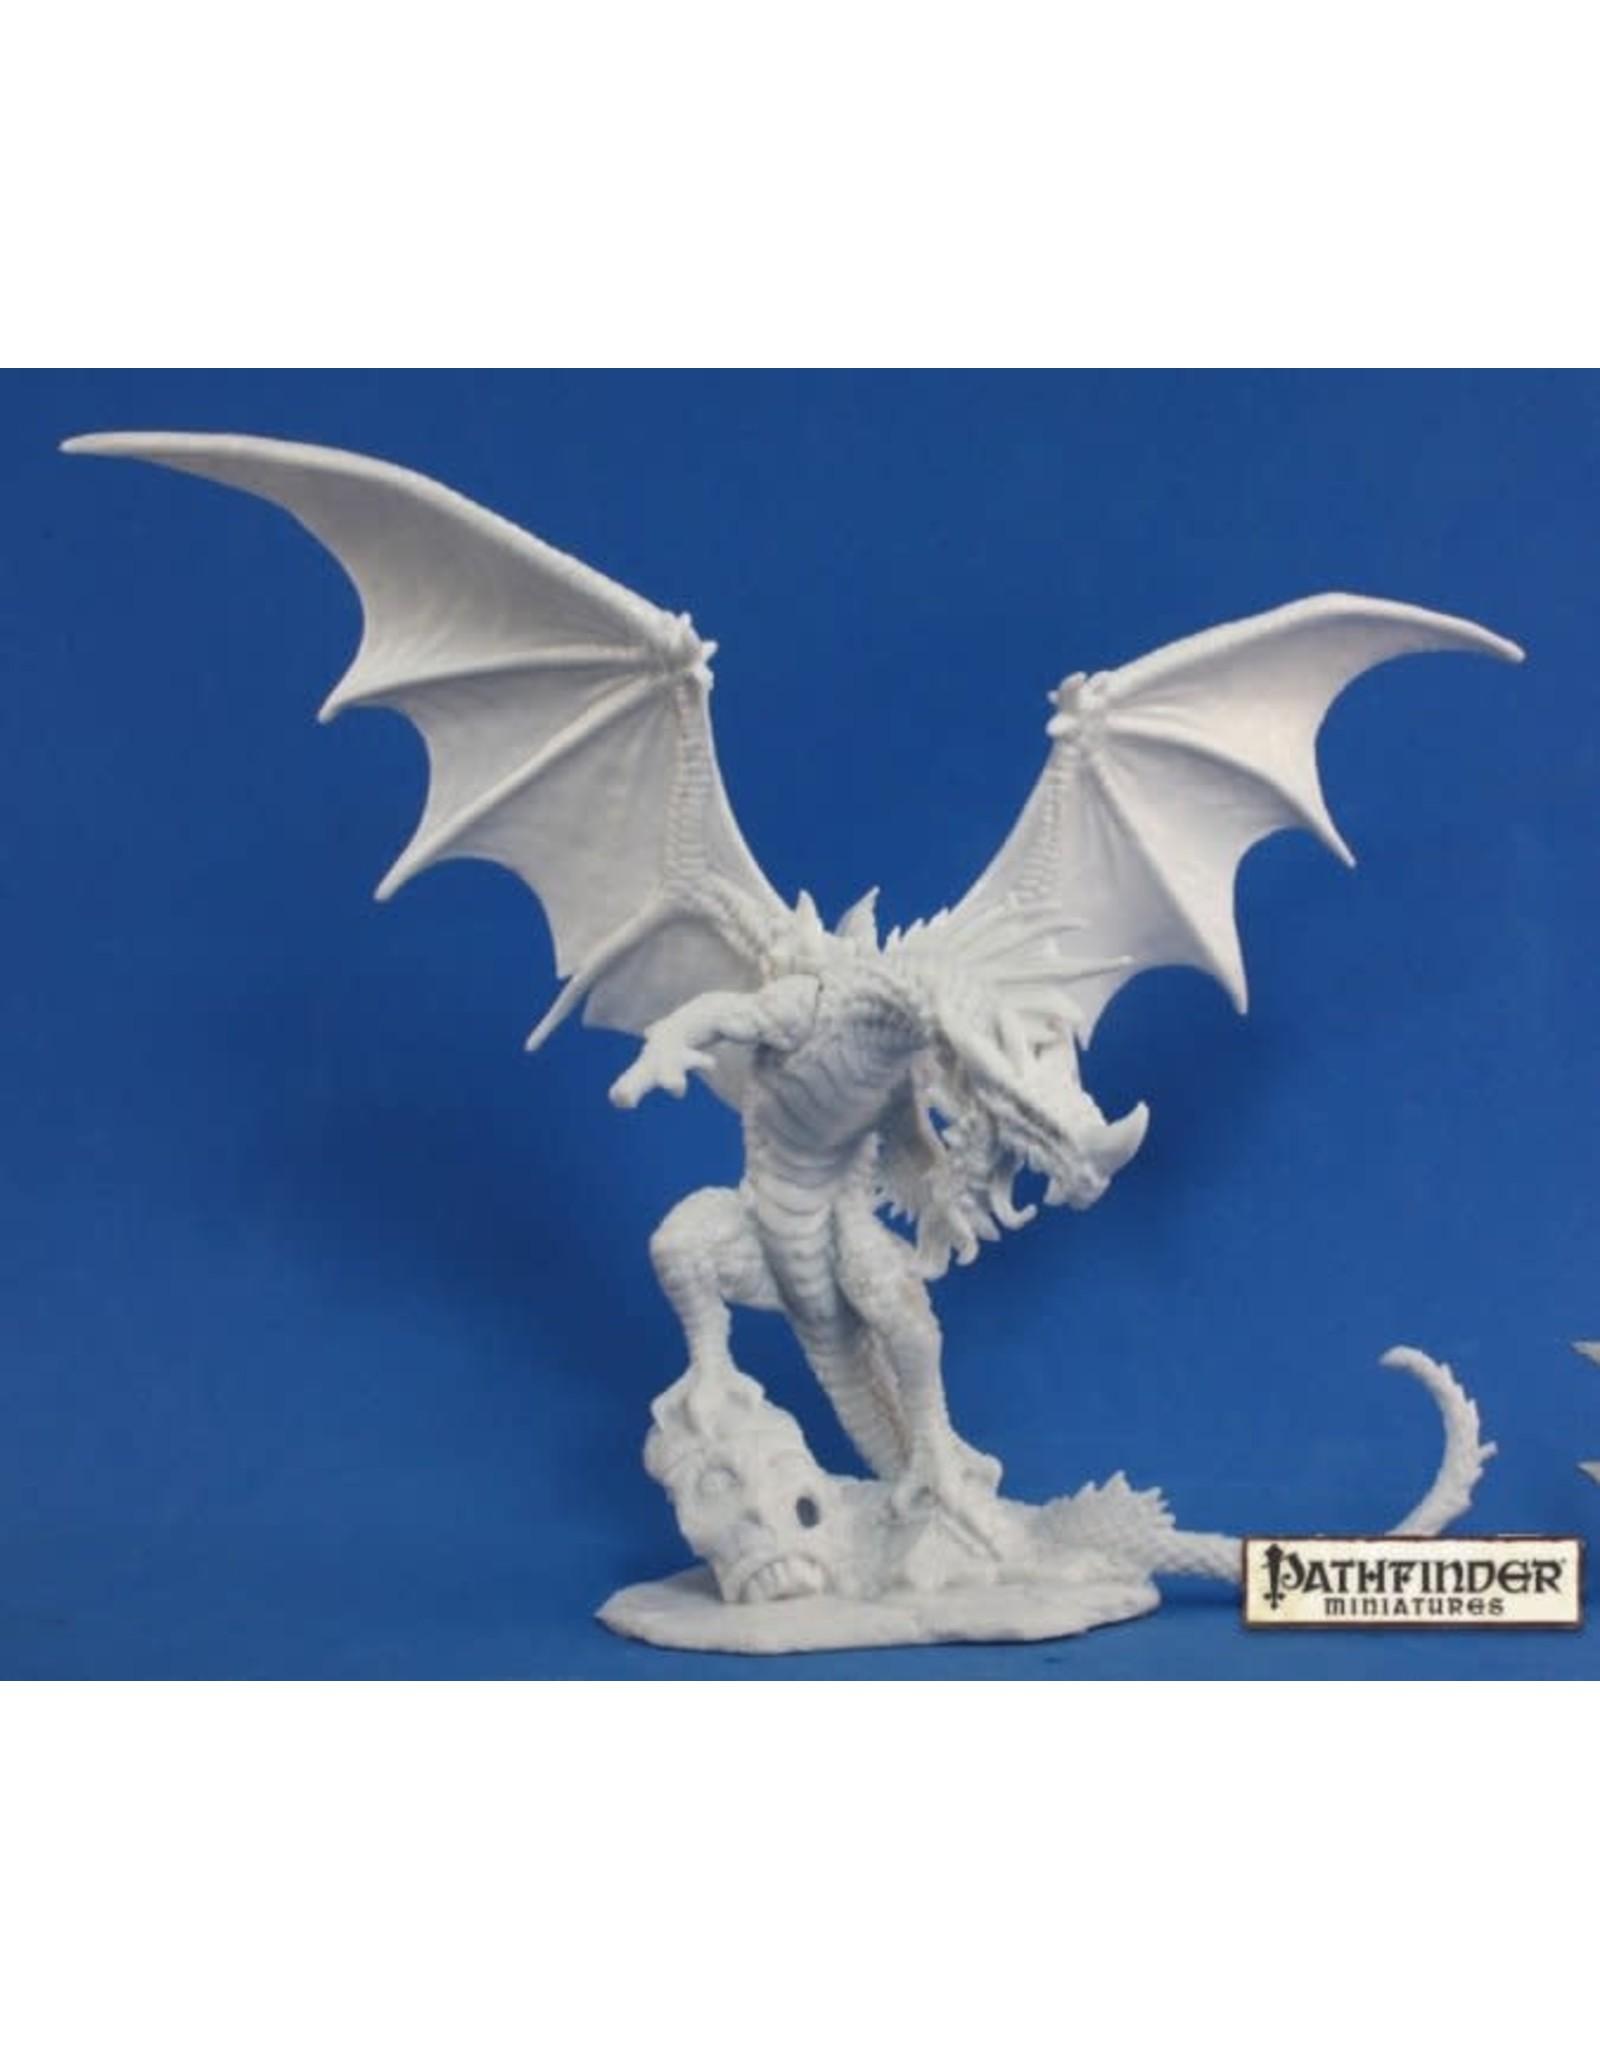 Reaper Miniatures Bones: Pathfinder Red Dragon